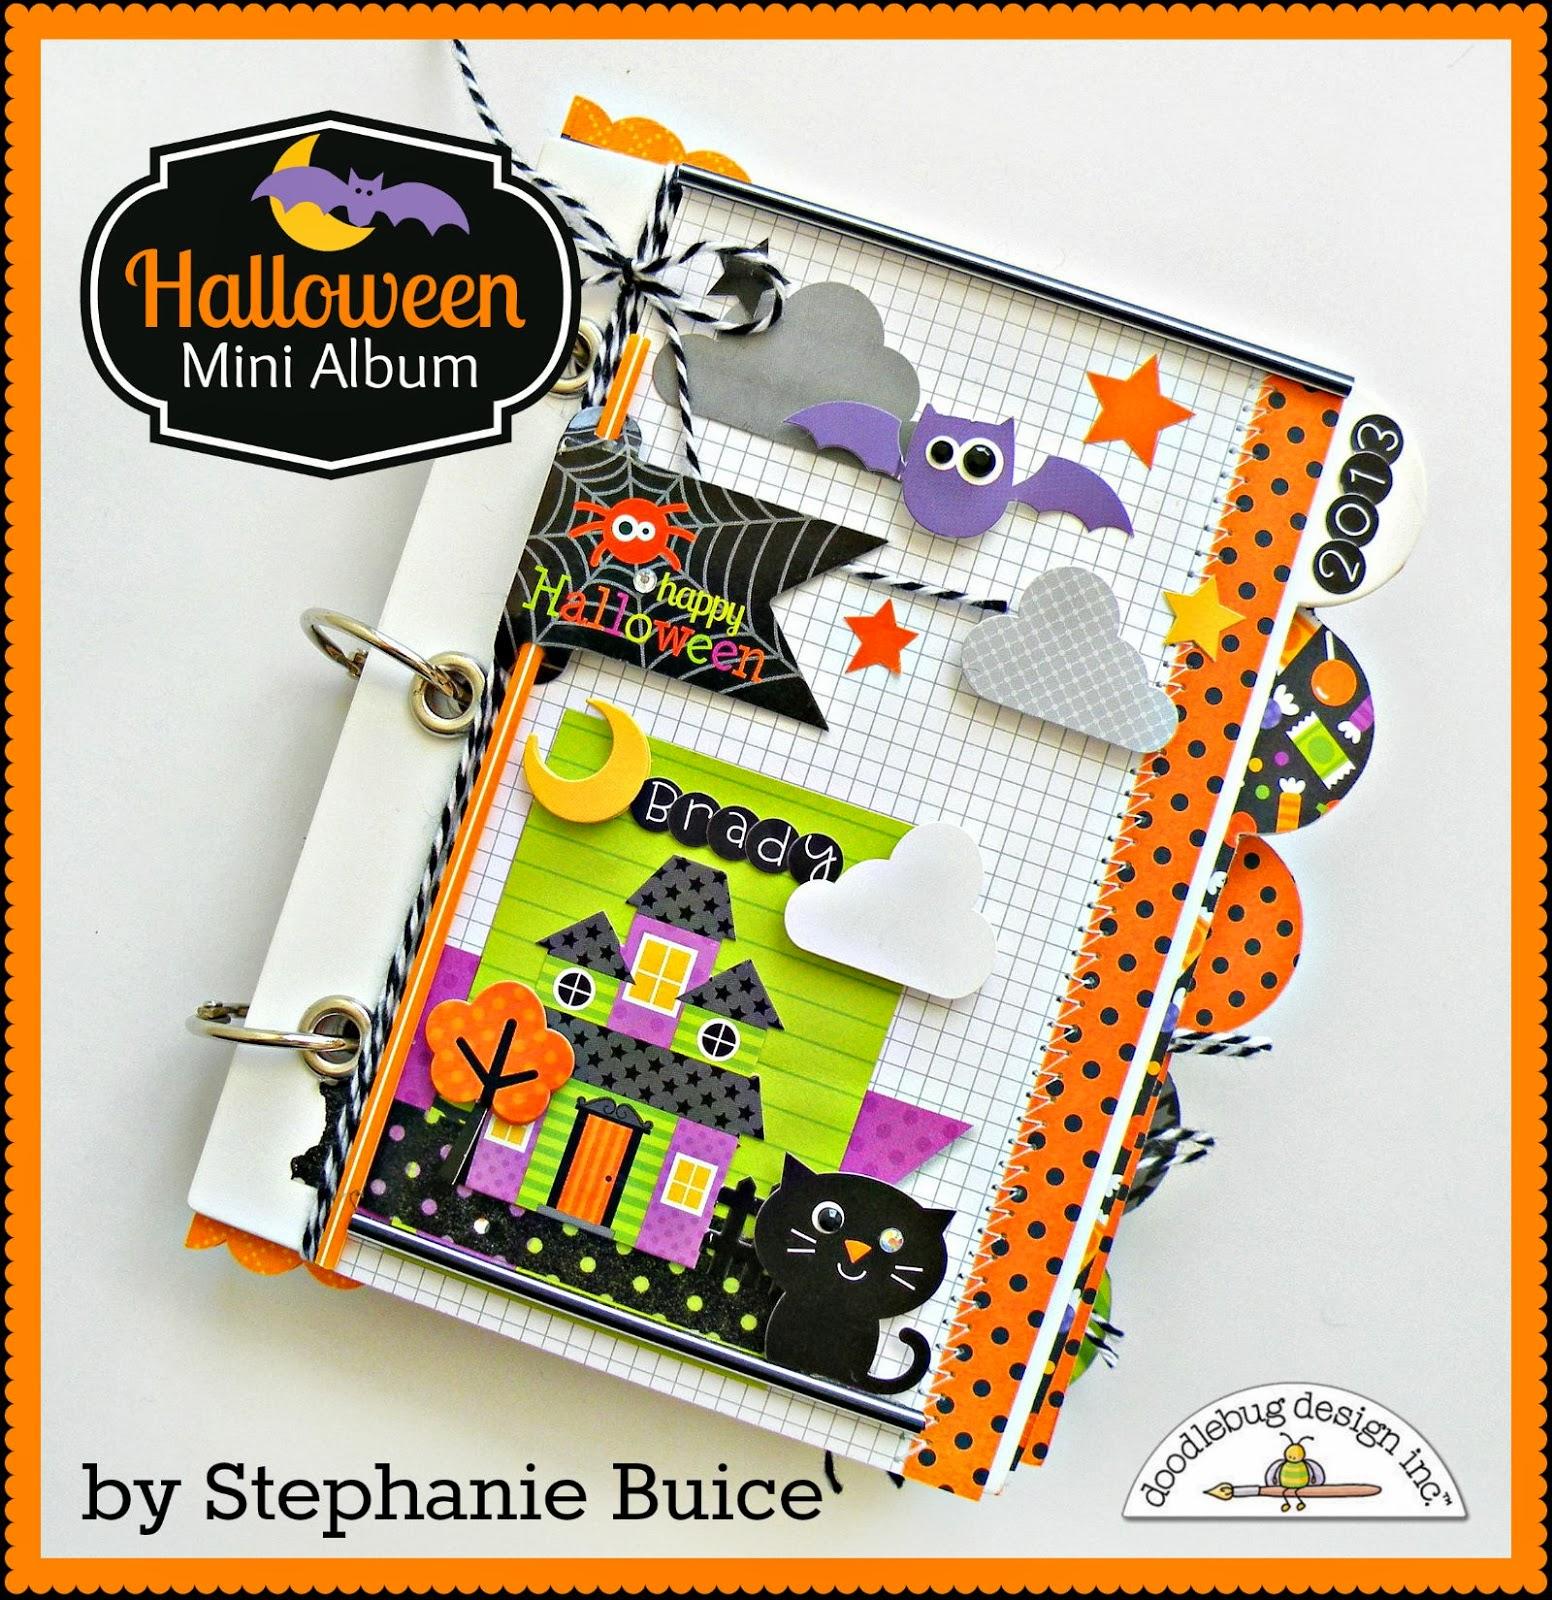 doodlebug design inc blog: prep your halloween mini album in advance